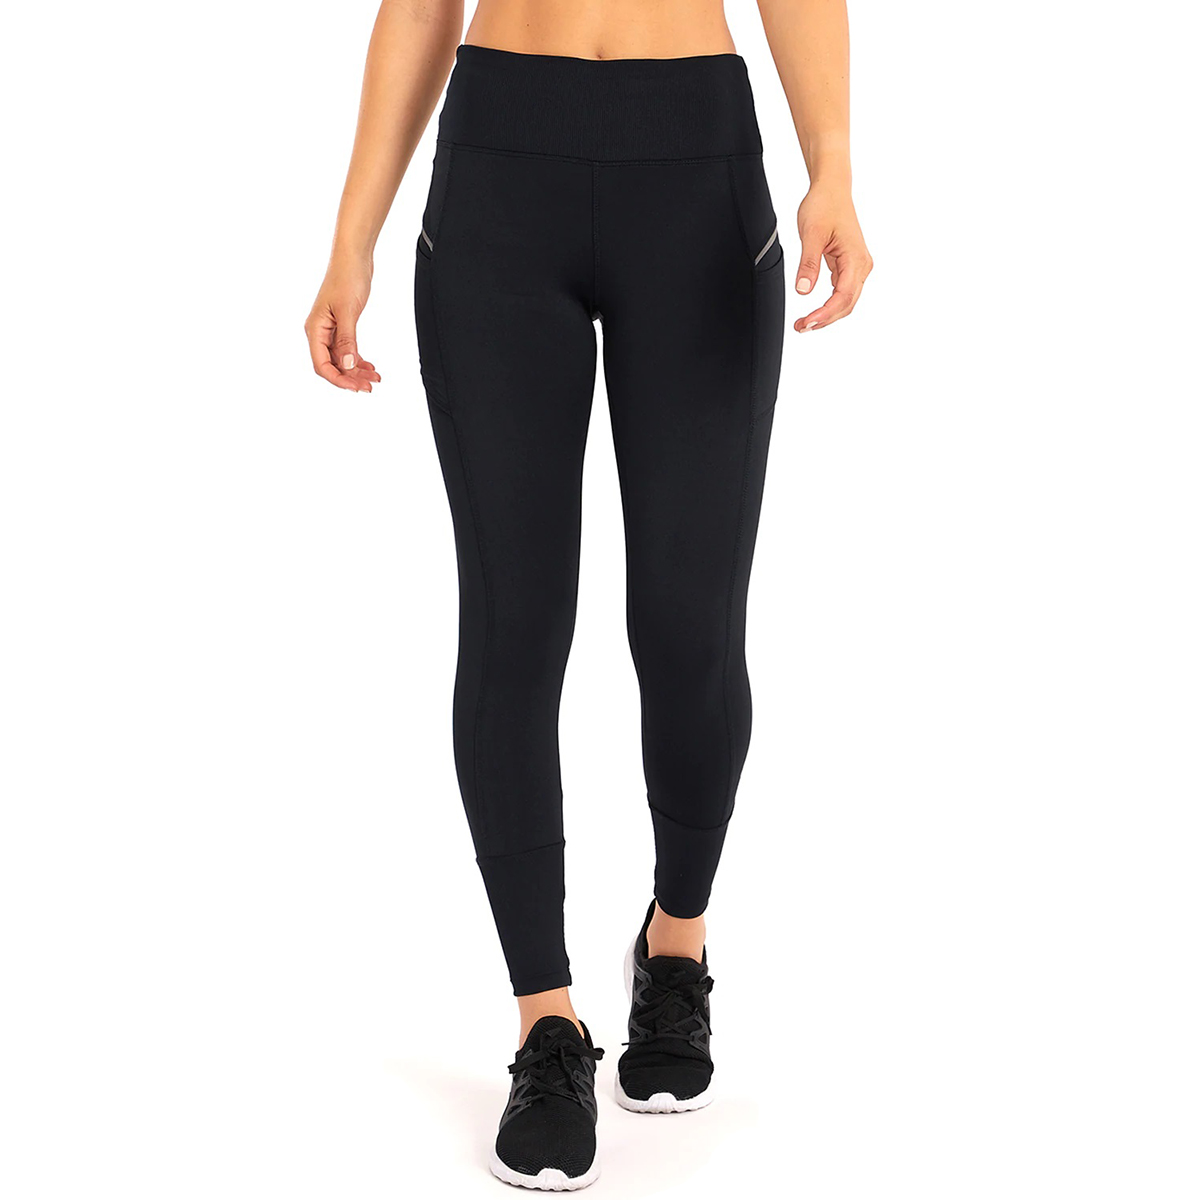 Marika Women's Jordan Ribbed-Trim Leggings - Black, XL